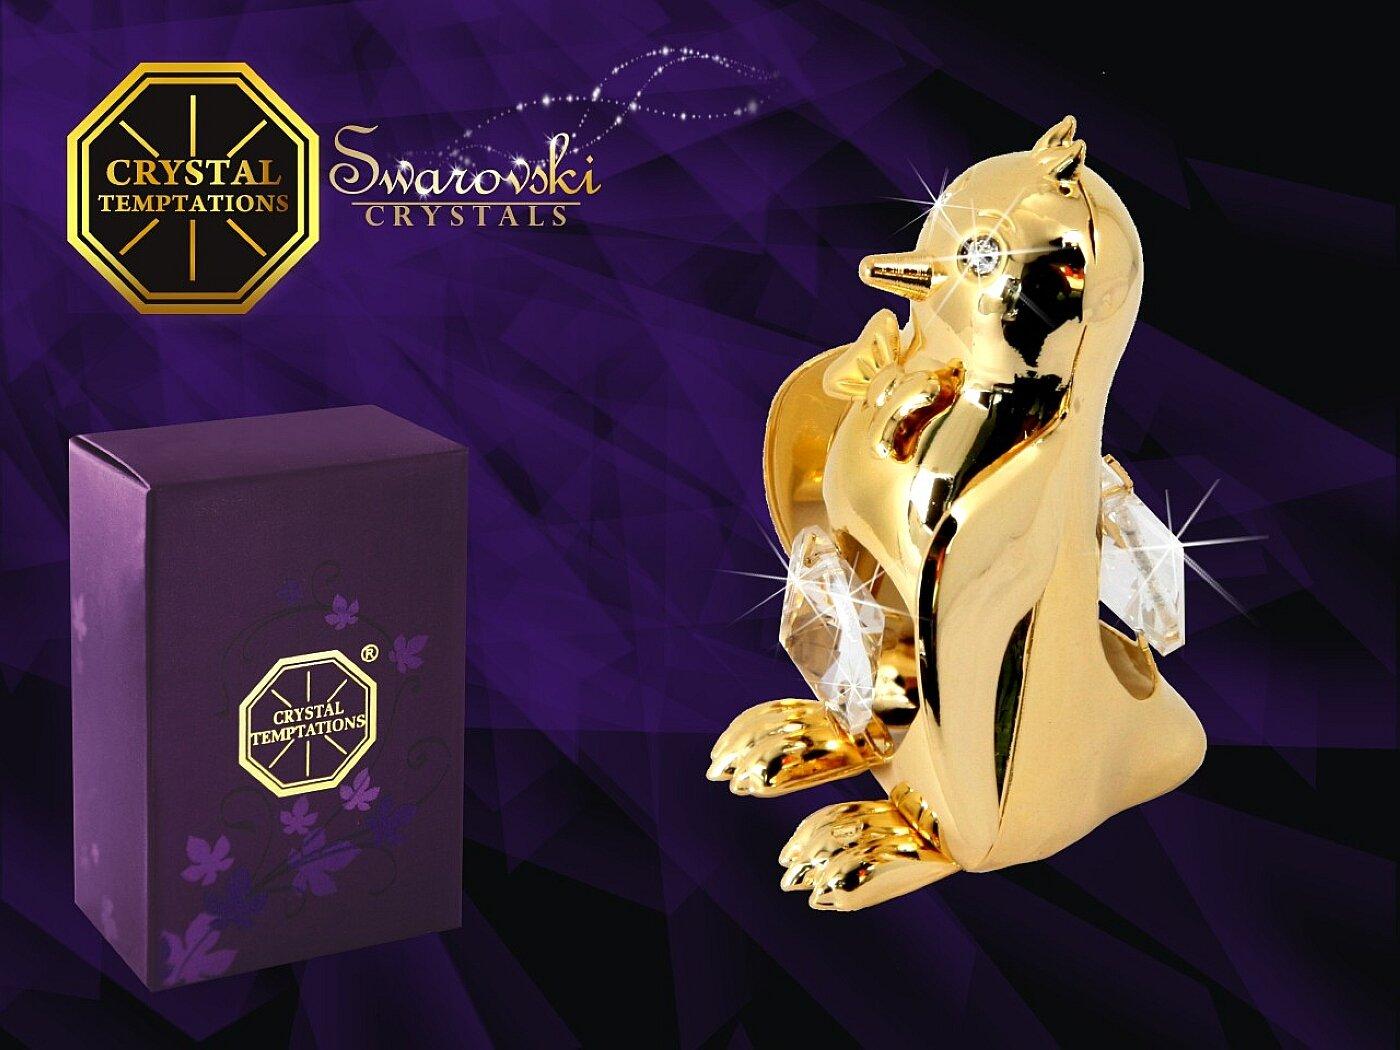 GERMANY CRYSTAL TEMPTATIONS - Pinguino con cristalli Swarovski